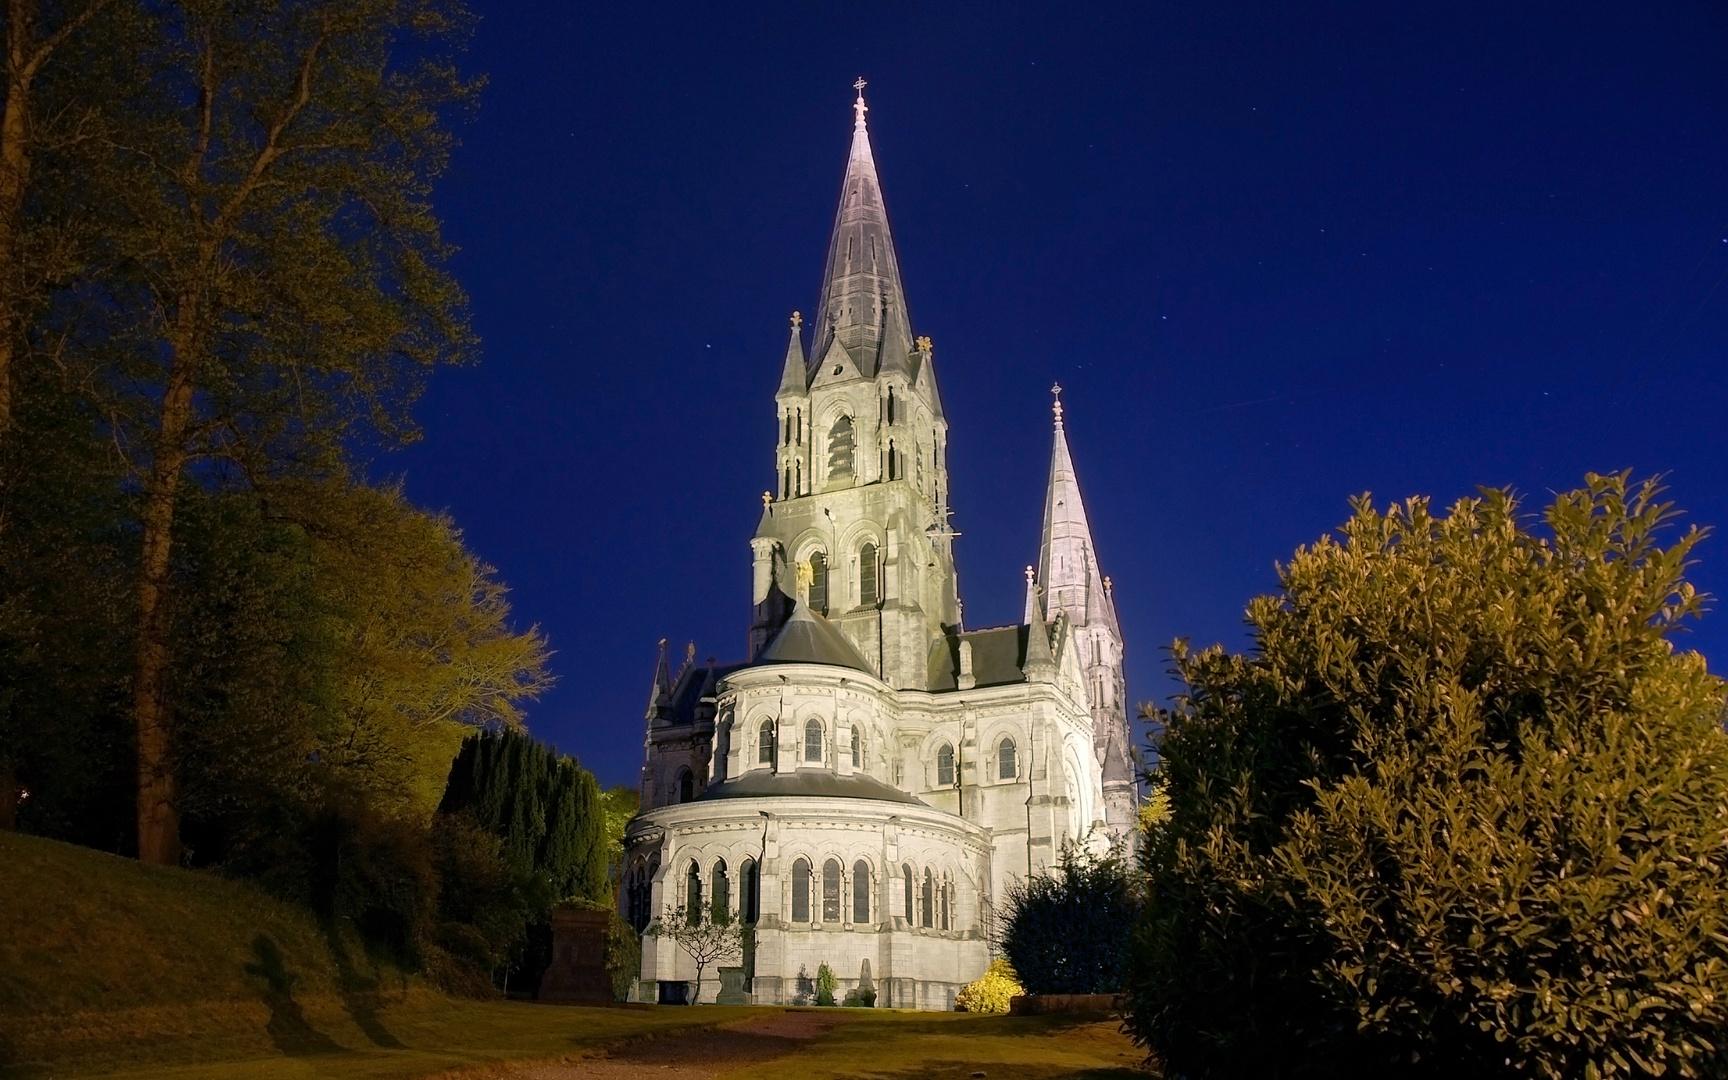 St. Finbars Cathedral - Irland Cork